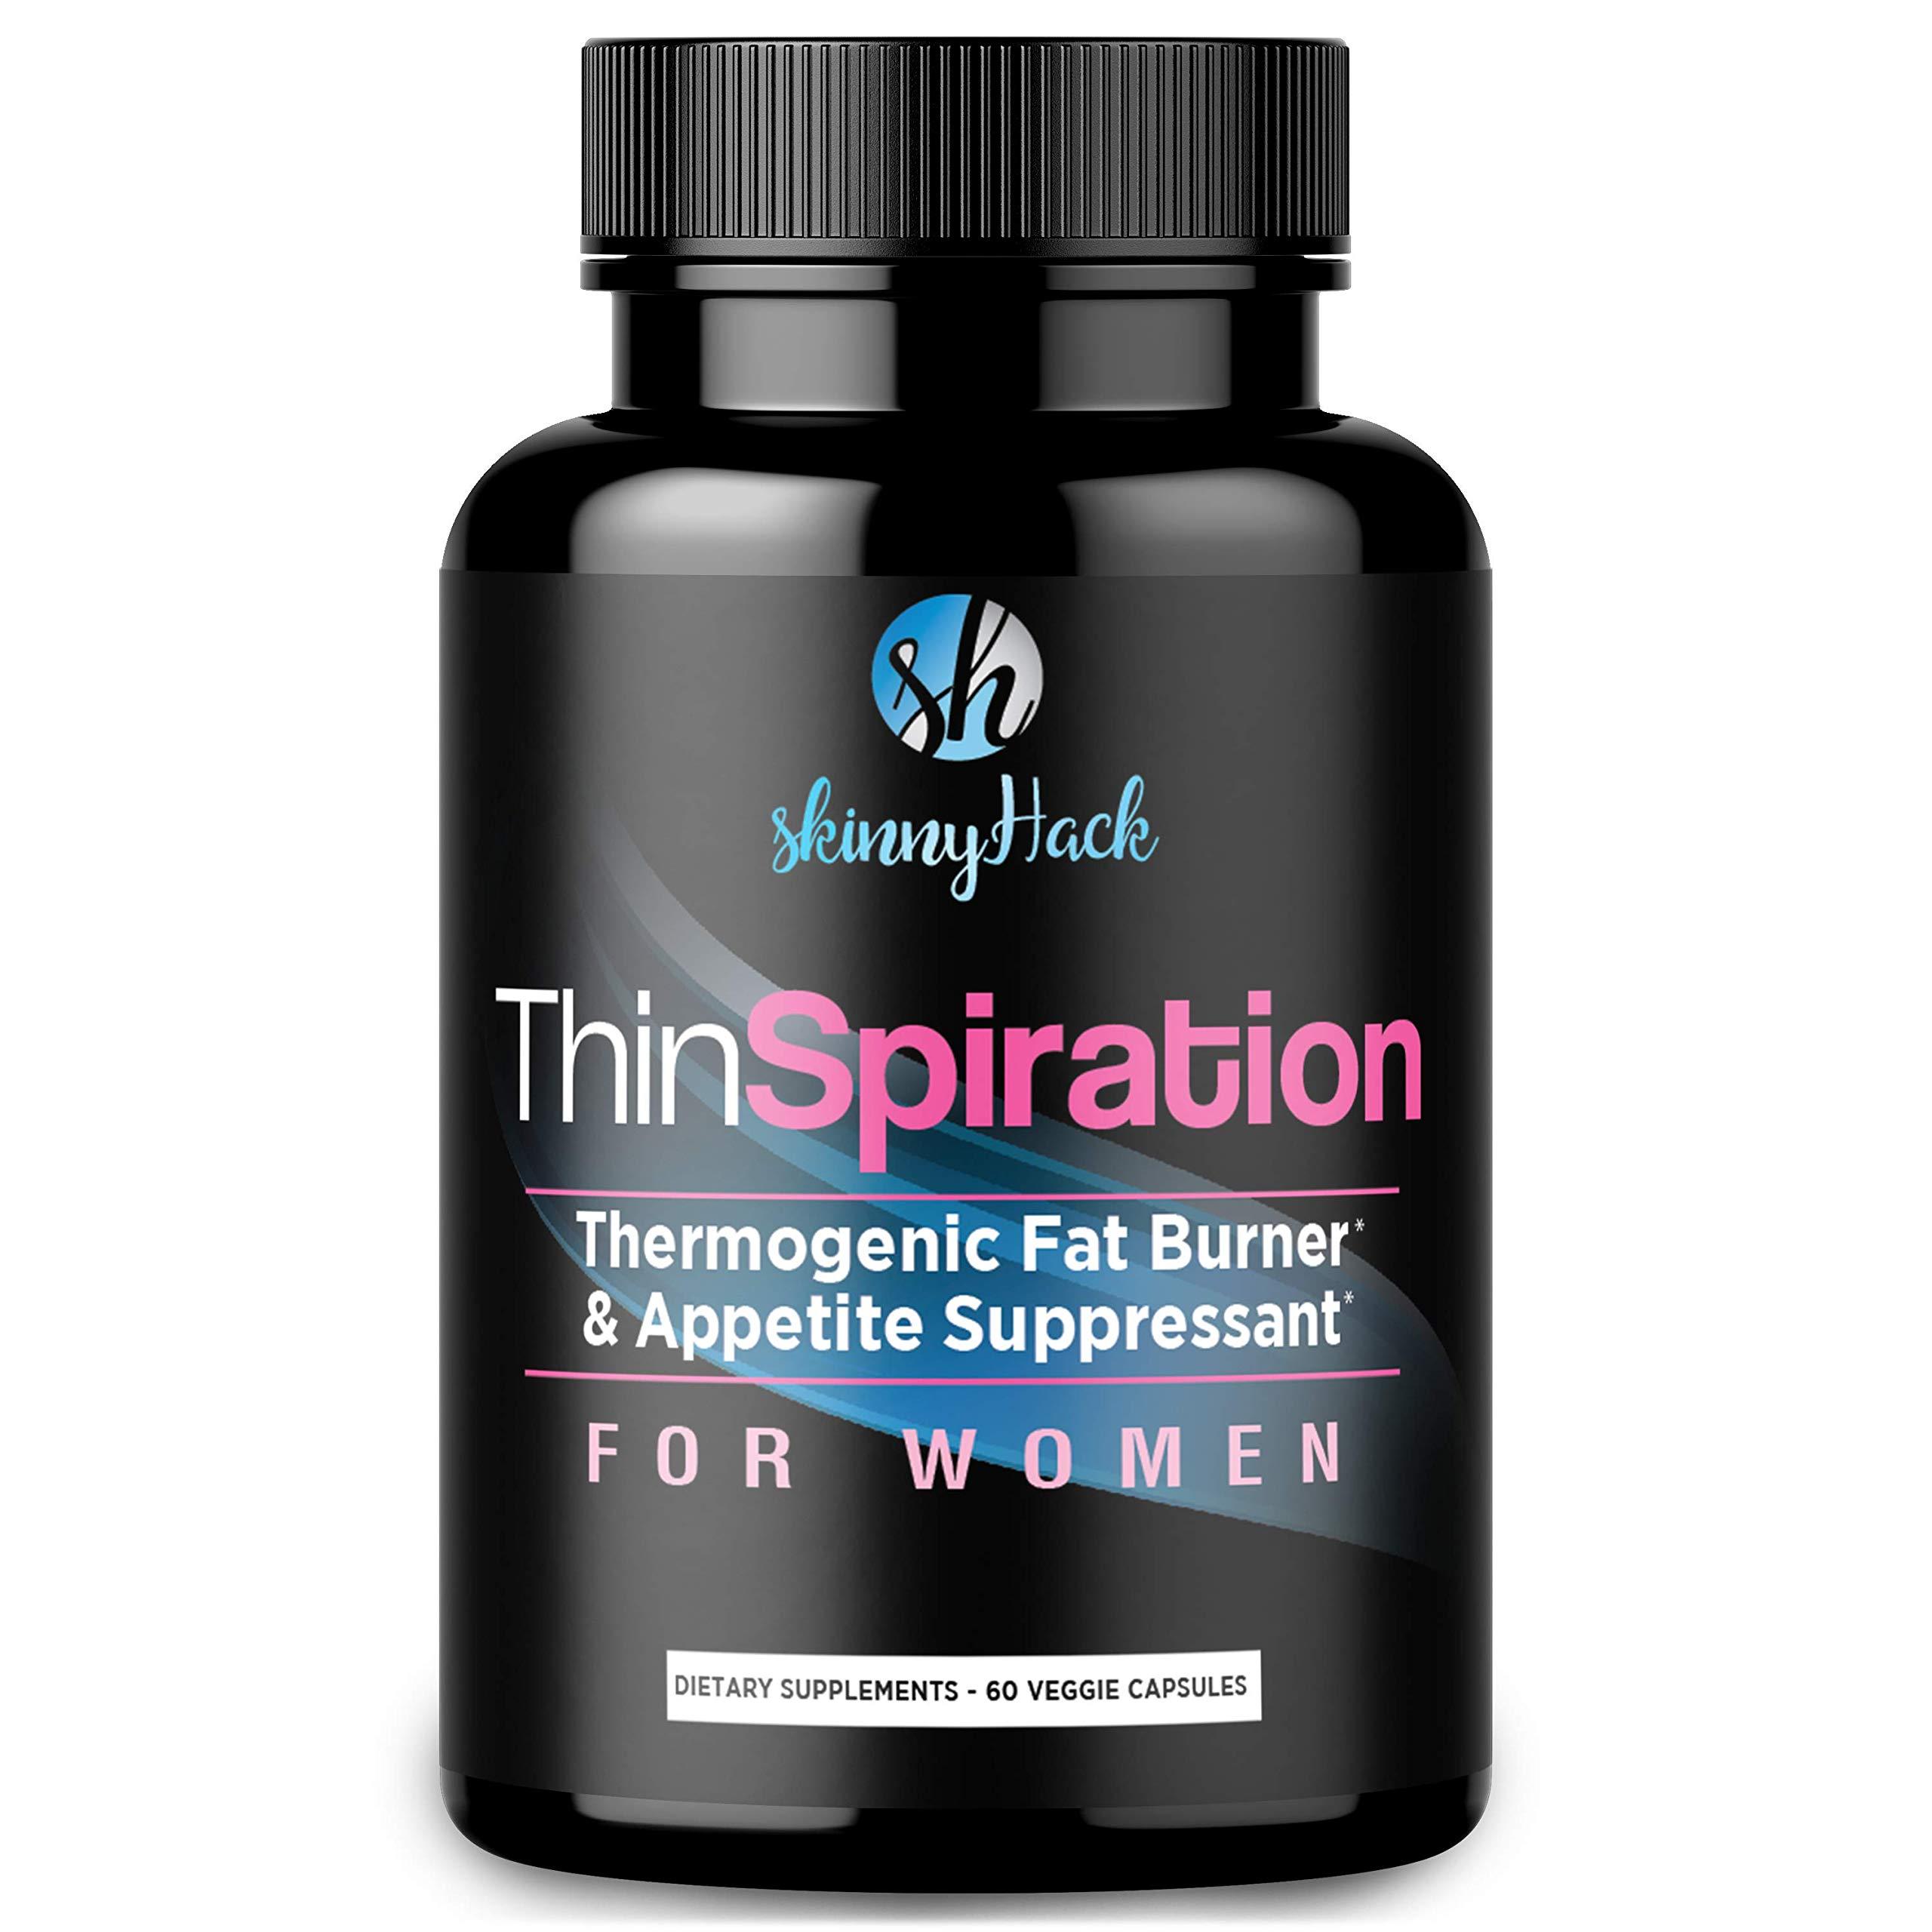 SkinnyHack - Thermogenic Fat Burner for Women - Weight Loss Pills, Metabolism Booster & Appetite Suppressant (60 Vegan Diet Pills for Women)